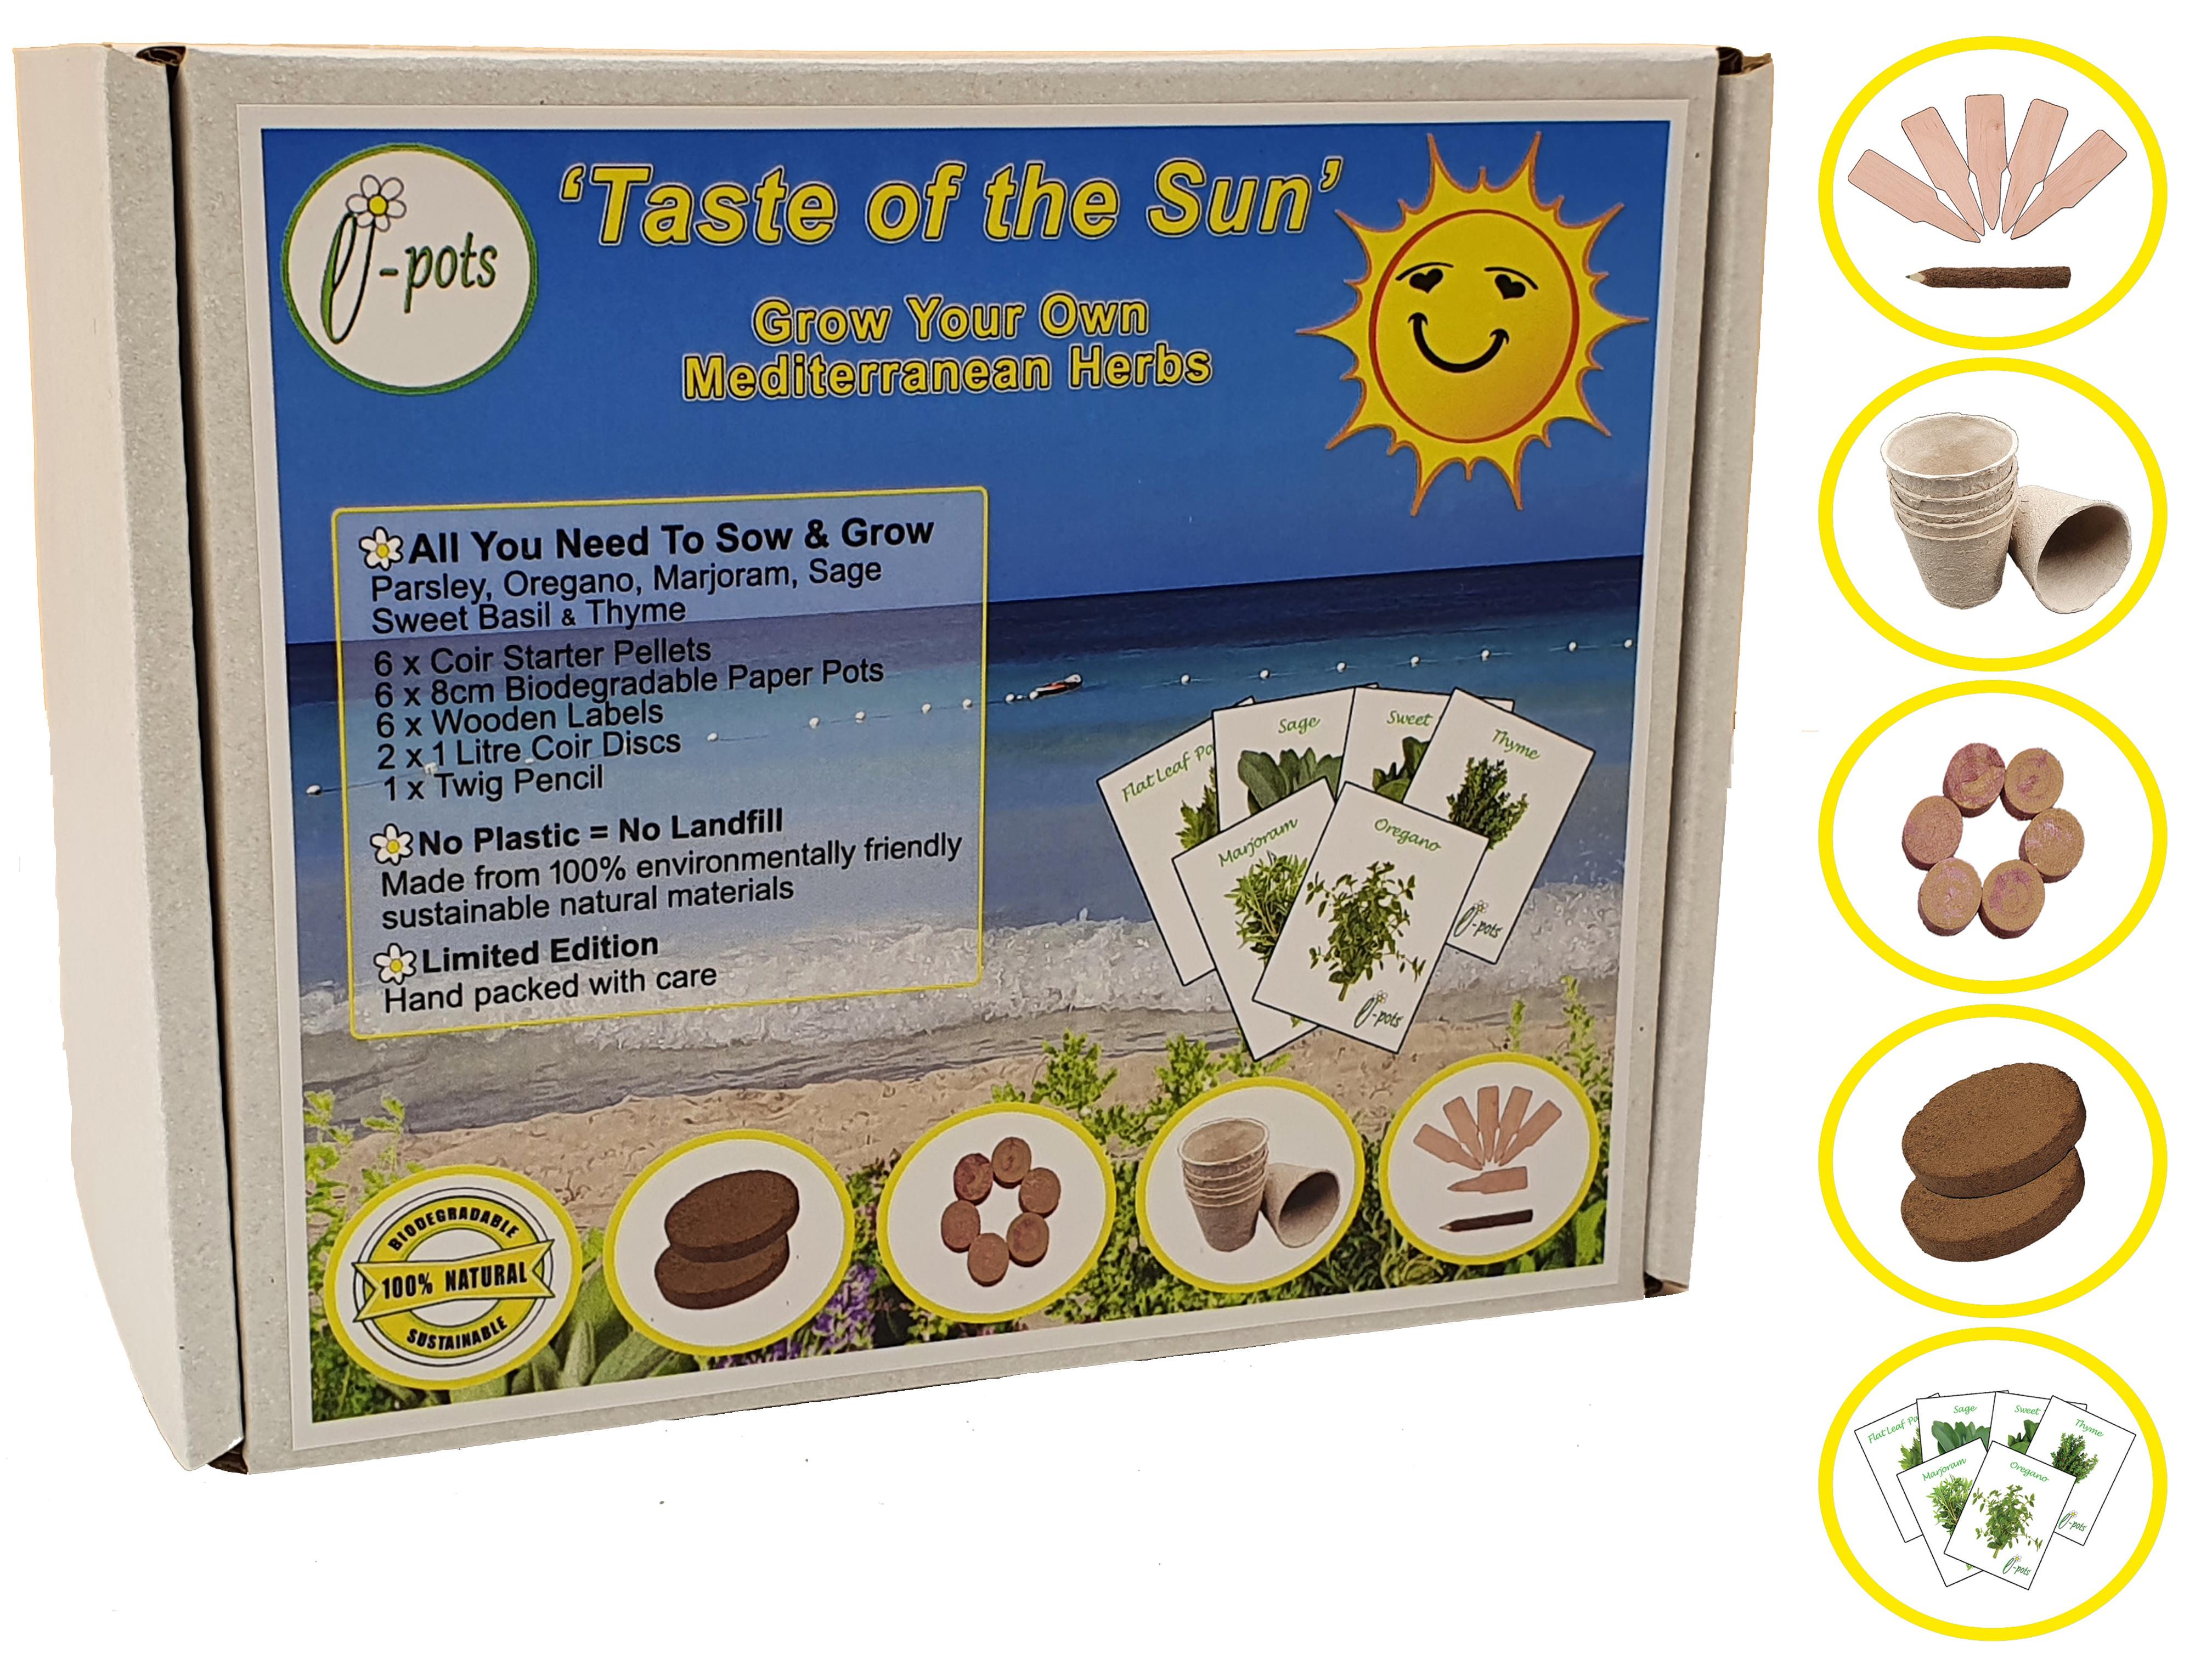 Taste of the Sun - Grow Your Own Mediterranean Herbs Kit